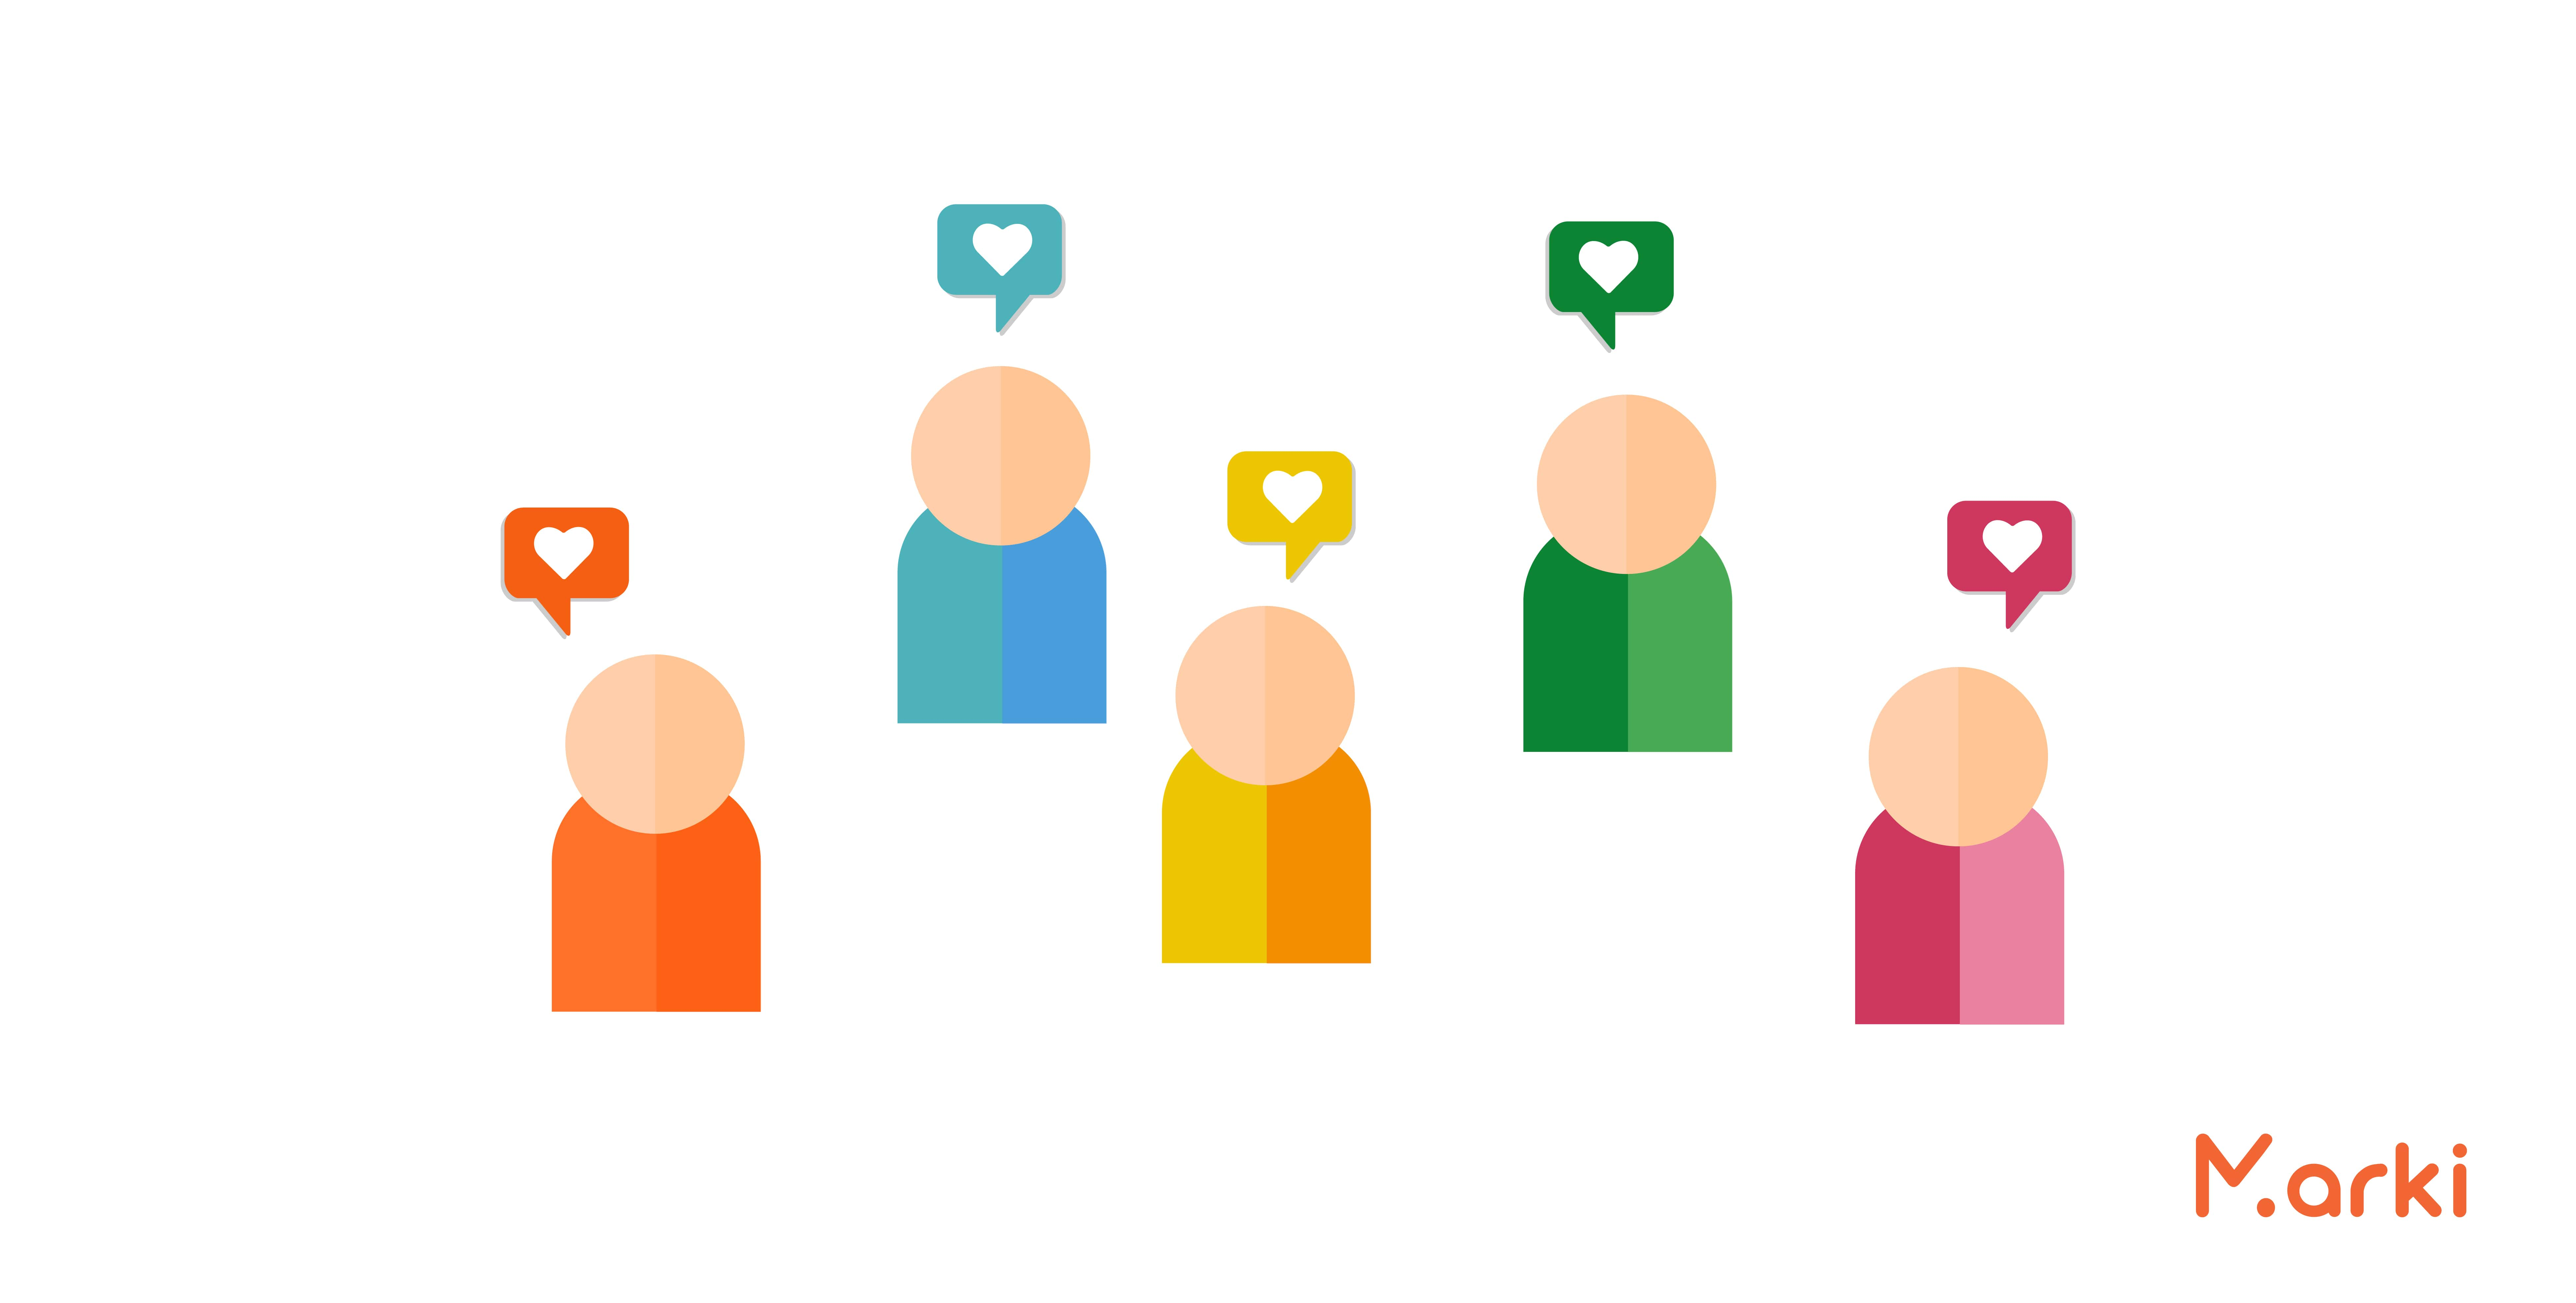 voluntariado marki programas de voluntariado ser voluntario voluntariado digital voluntariado en linea voluntariado marki voluntariado mexico voluntariado online voluntariado peru voluntariado virtual